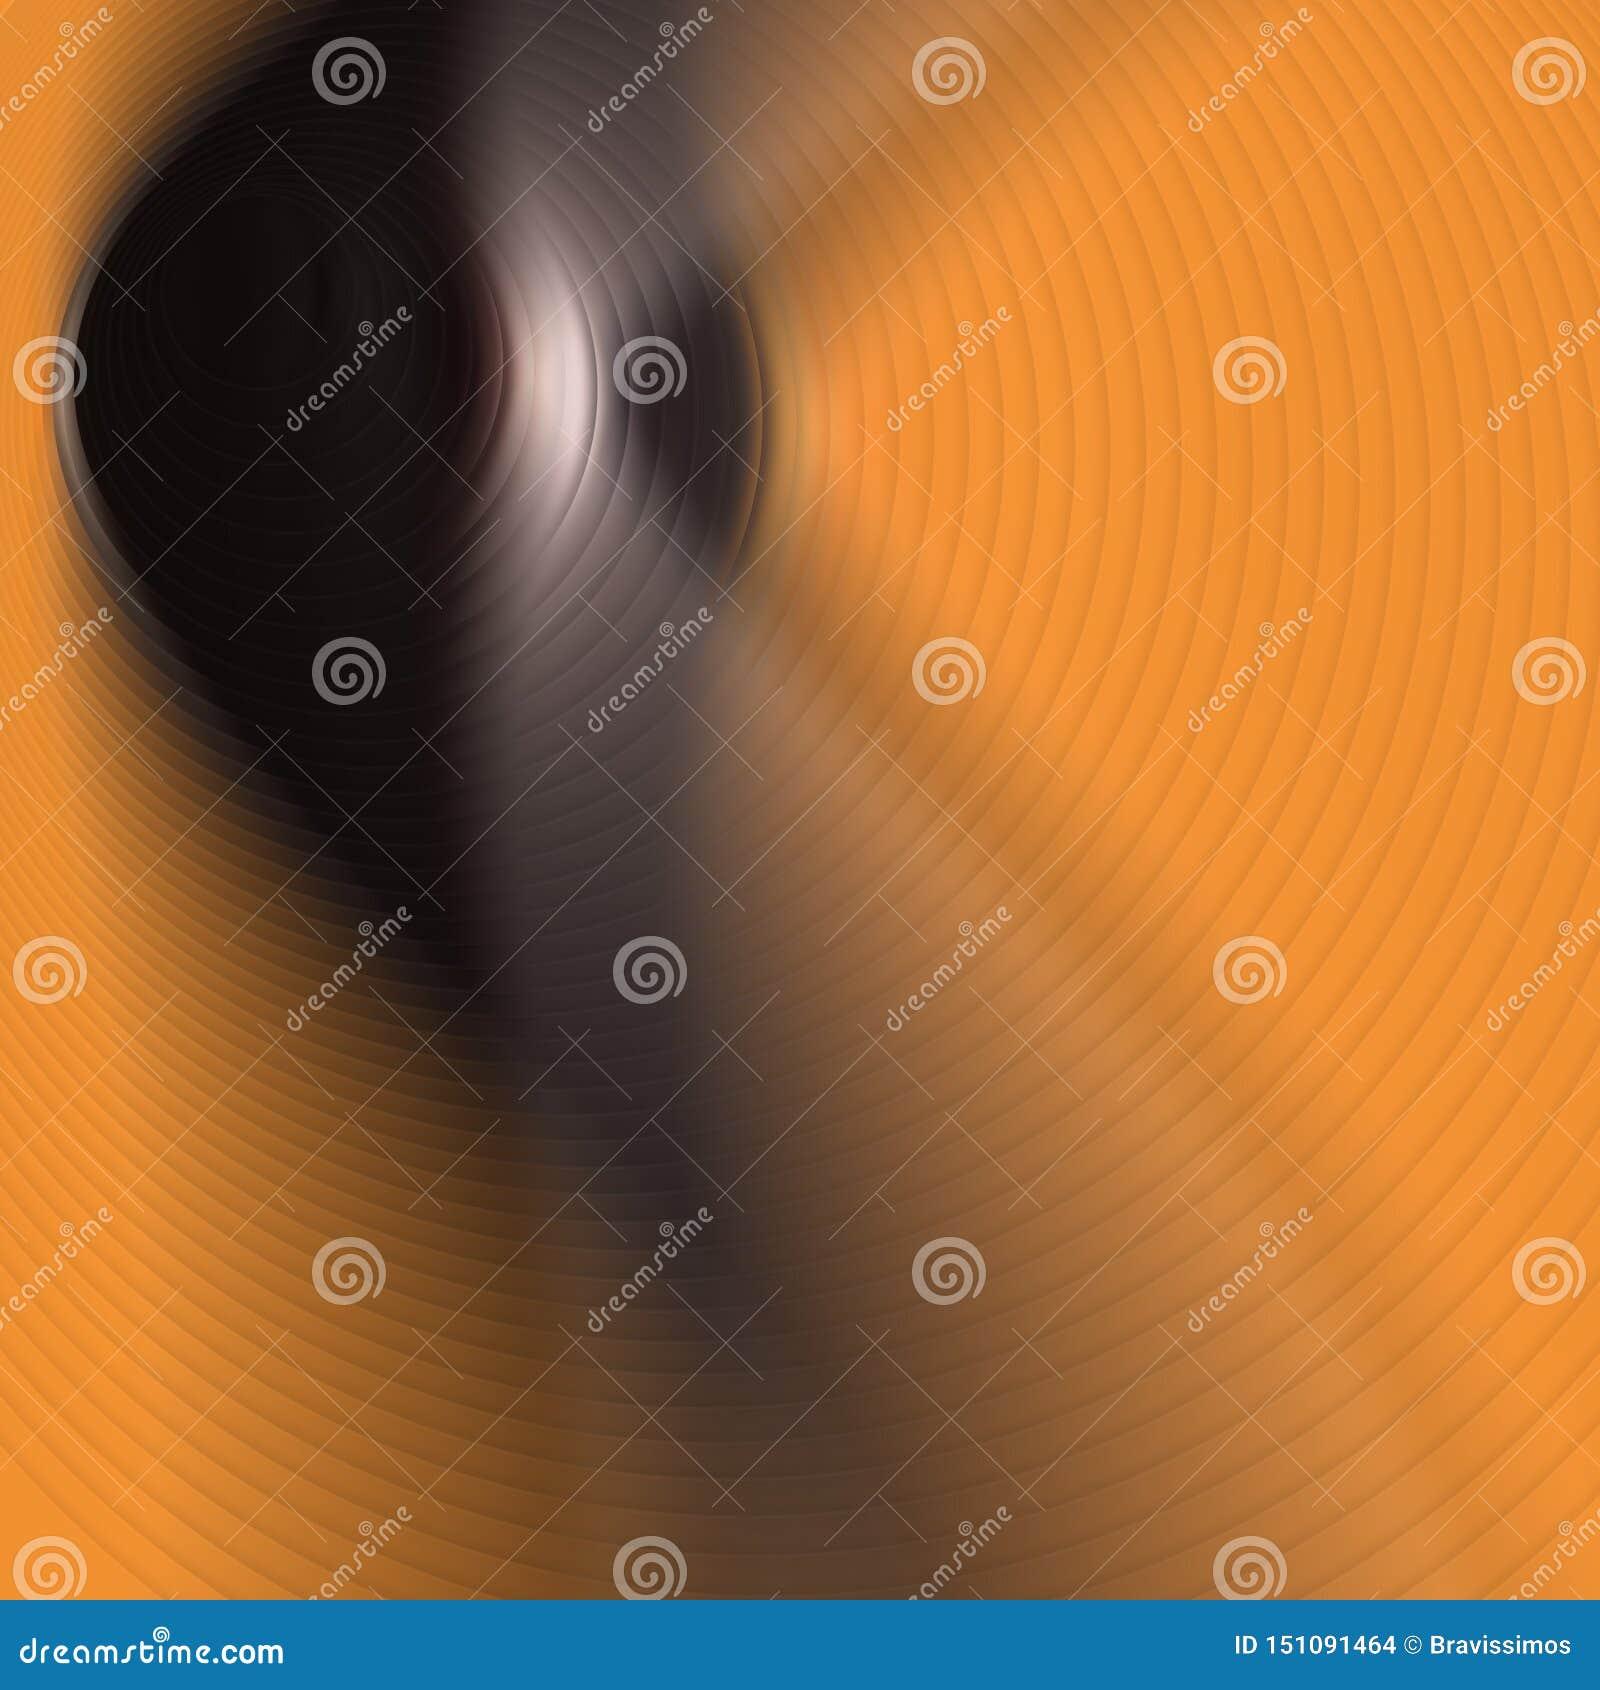 Abstract Orange Yellow Gradient Background. Wallpaper